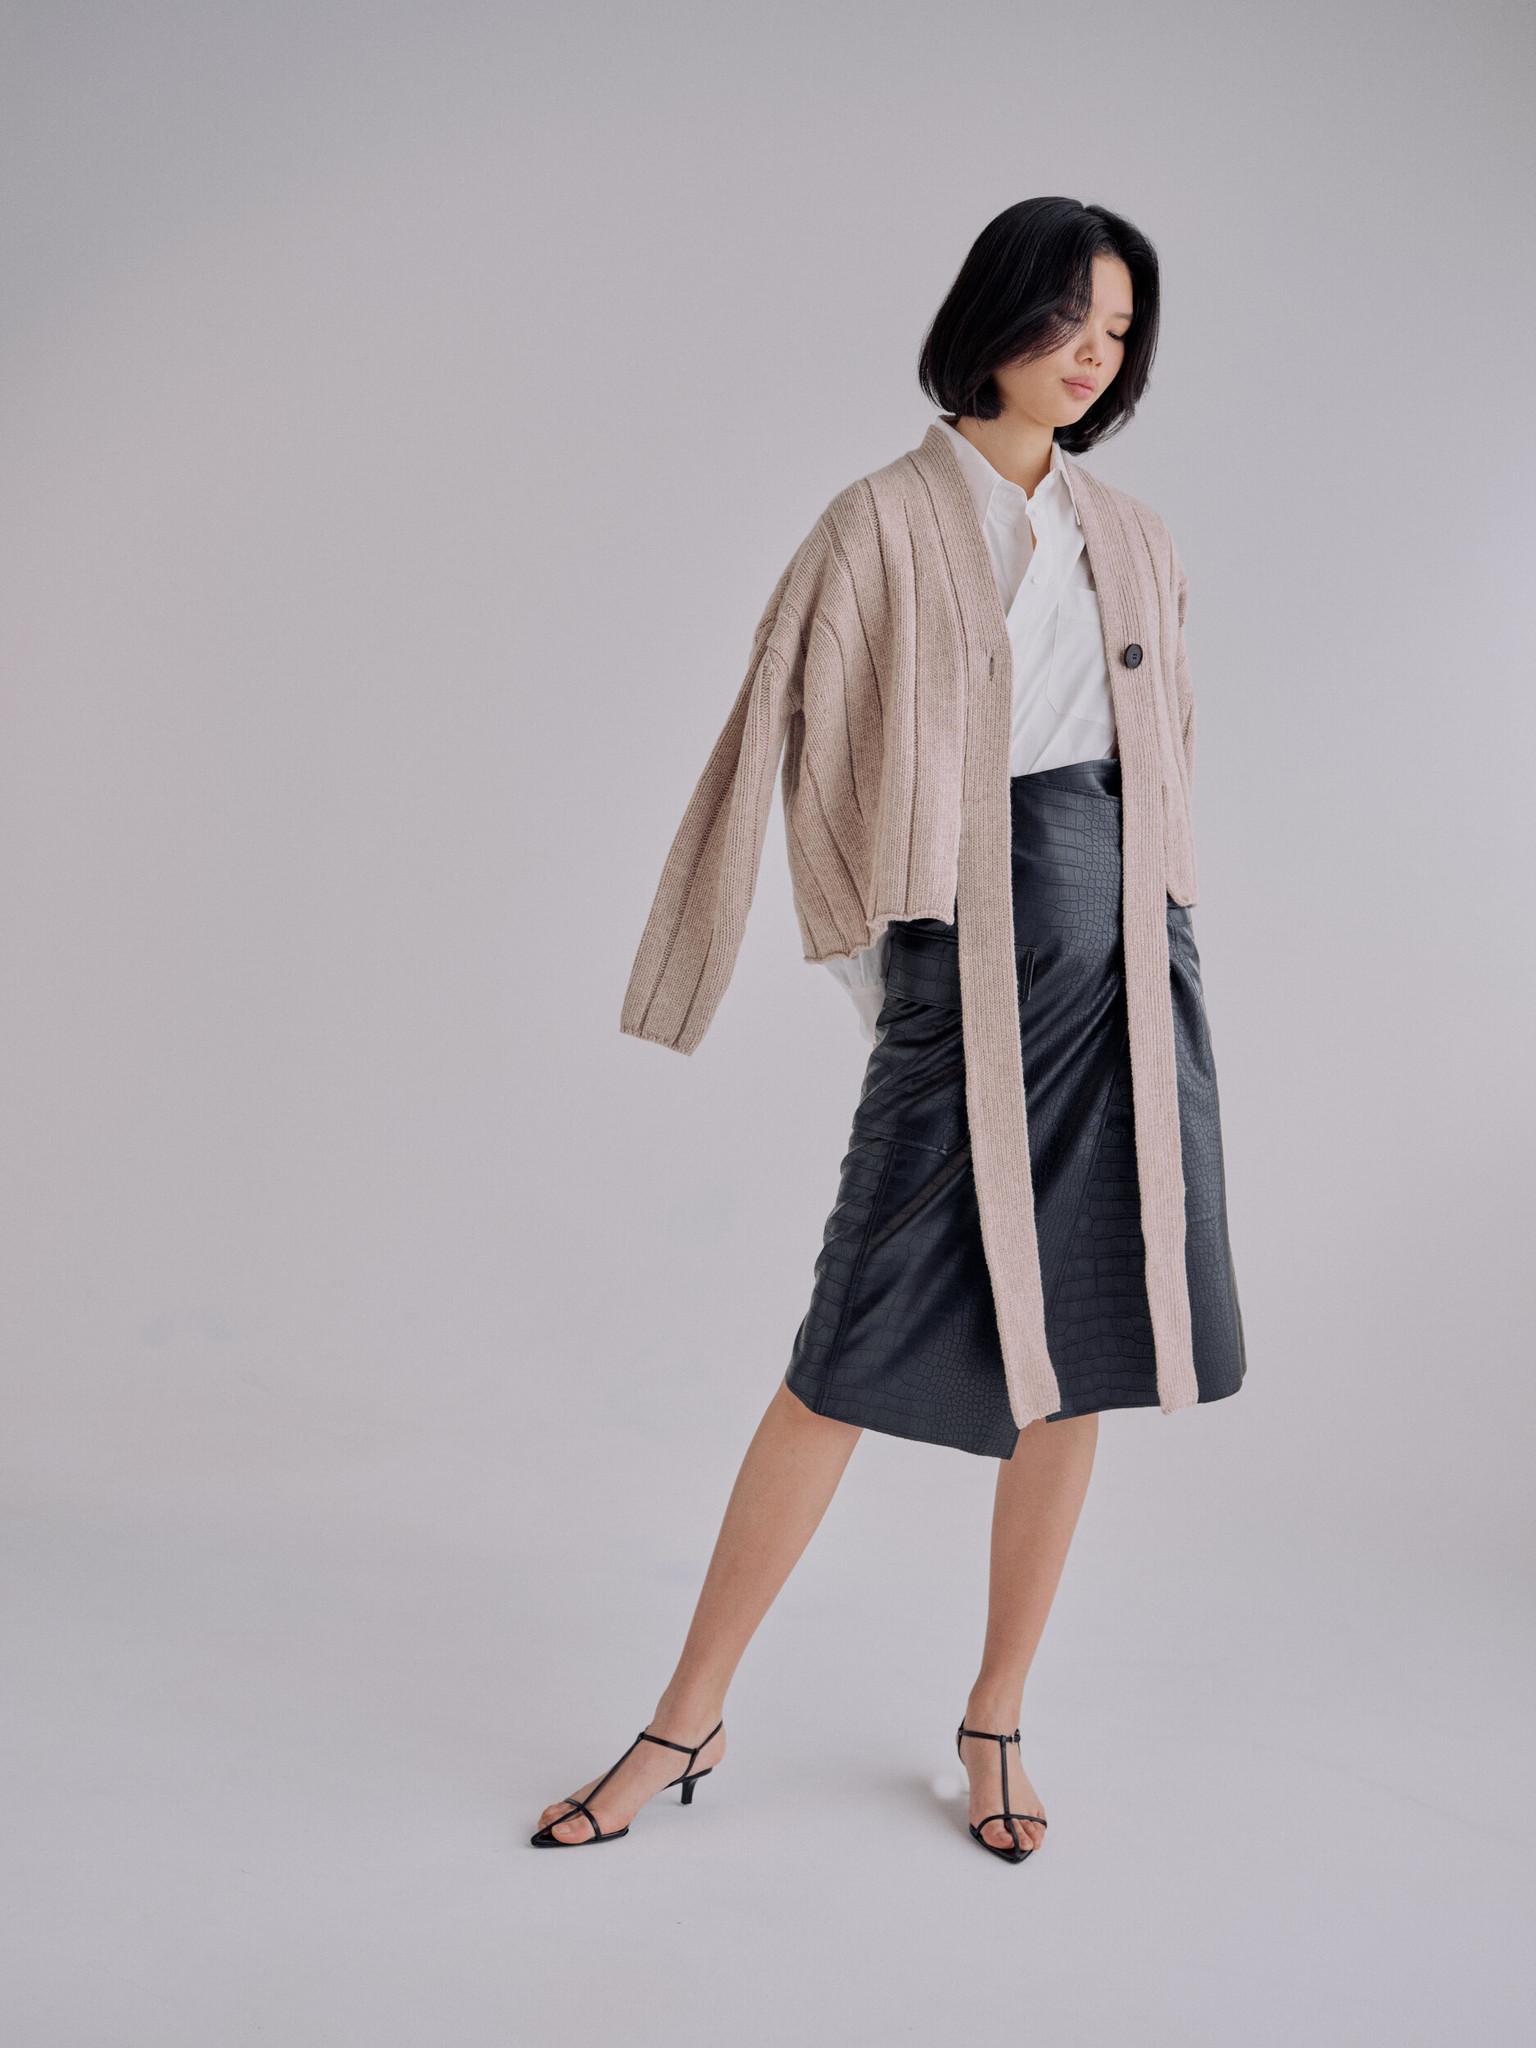 Mijeong Park Croc Embossed Leather Skirt, Black